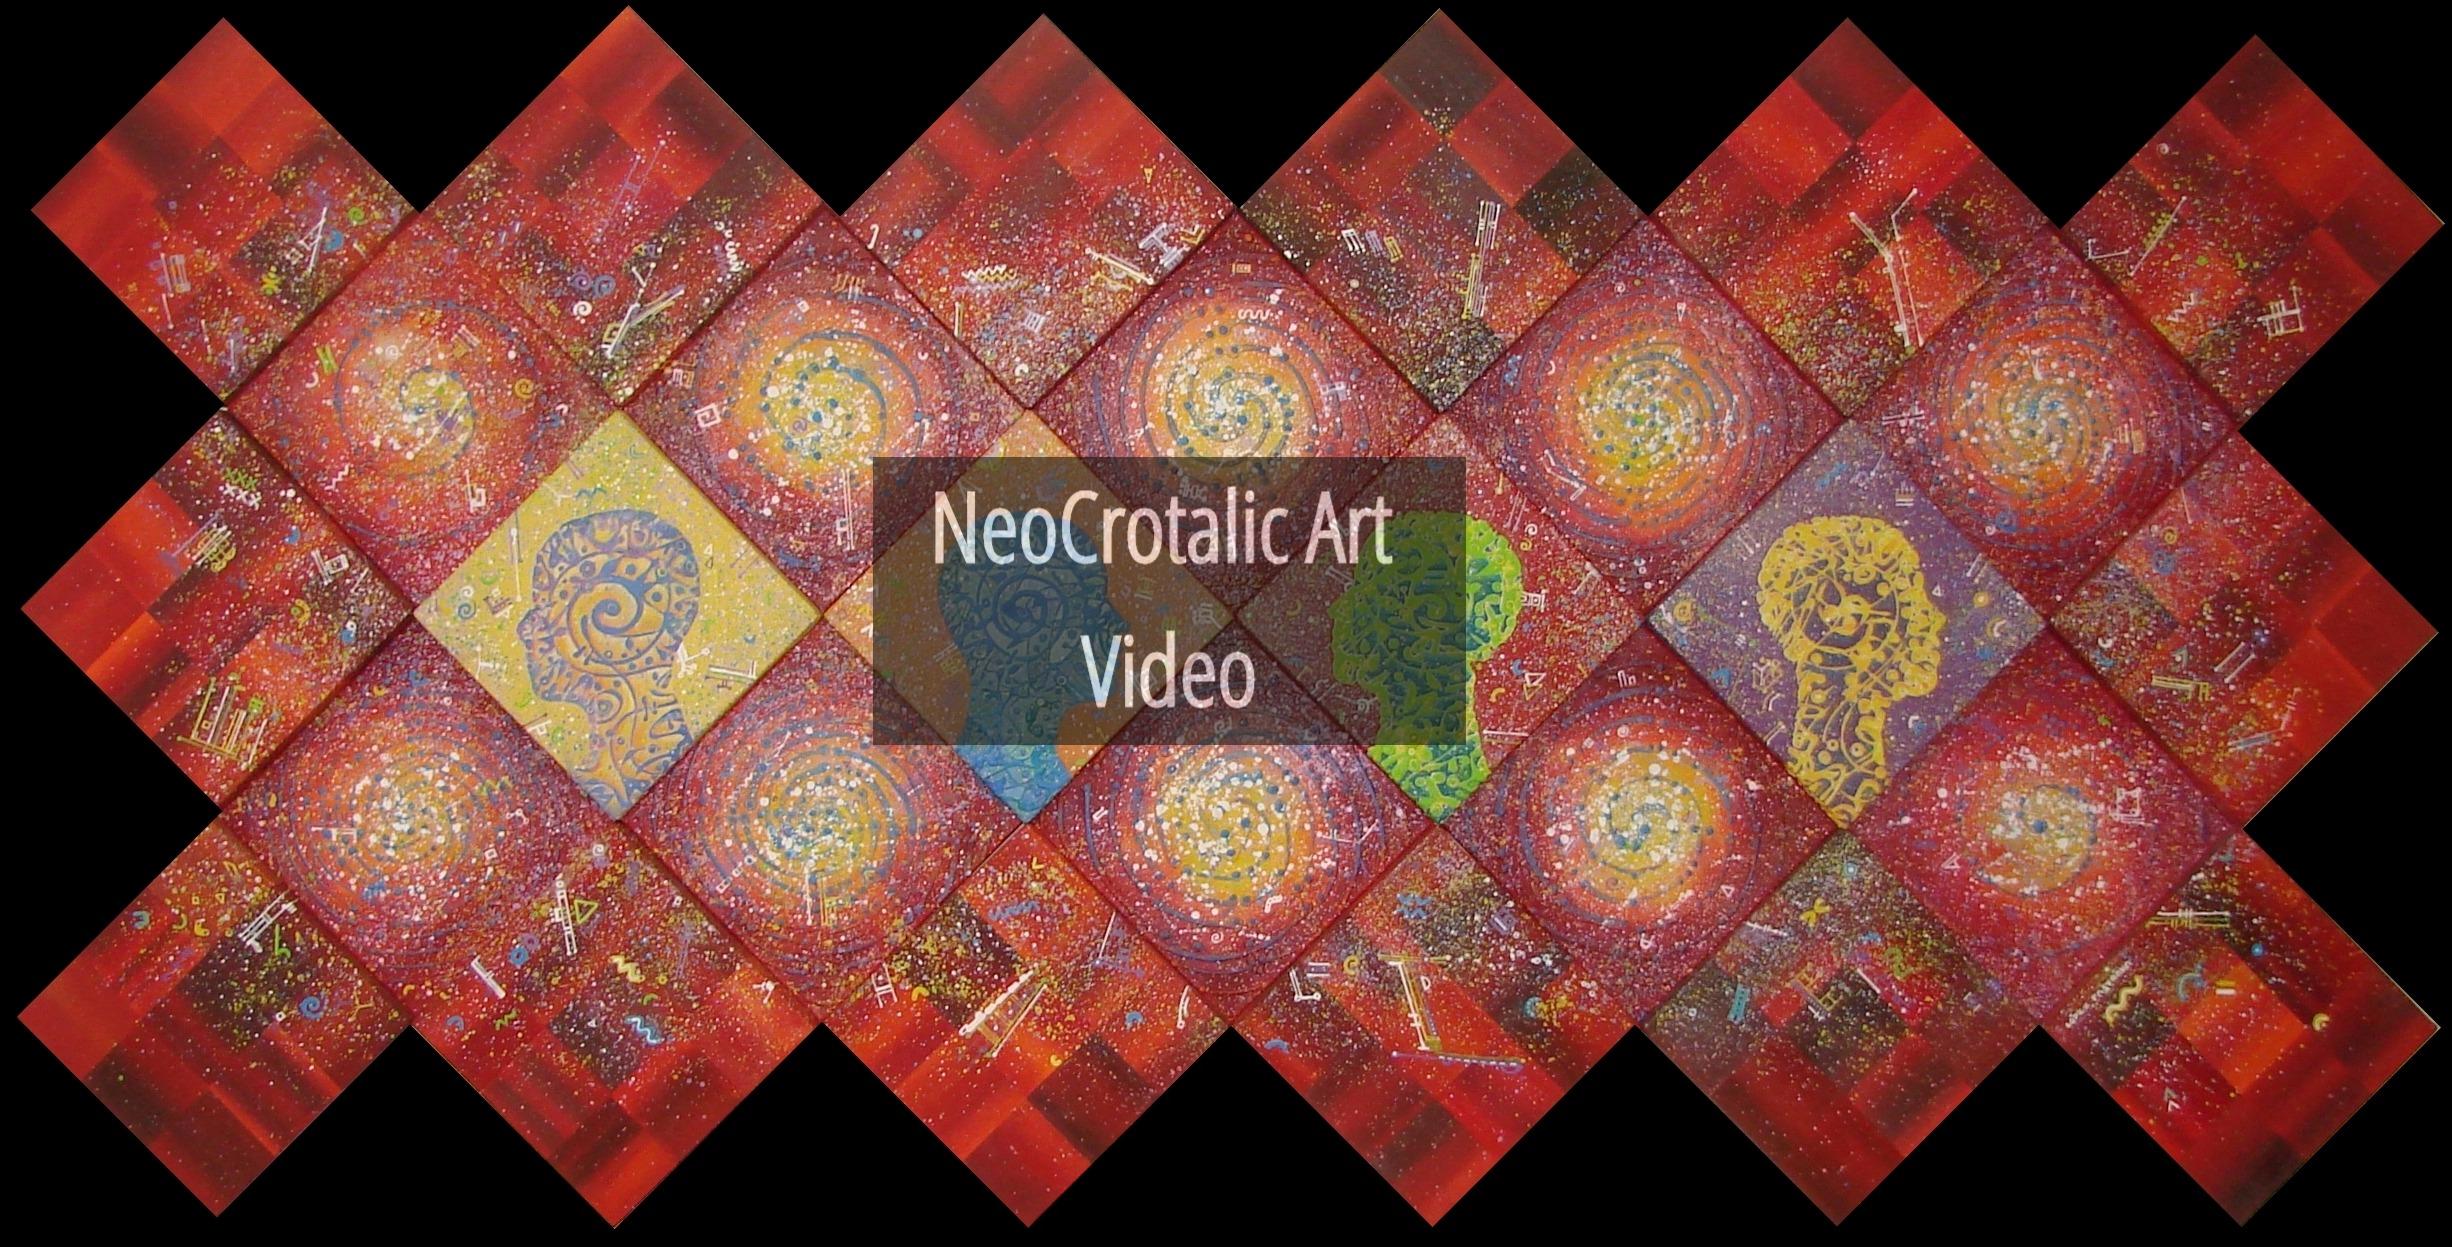 Neocrotalic Art Video